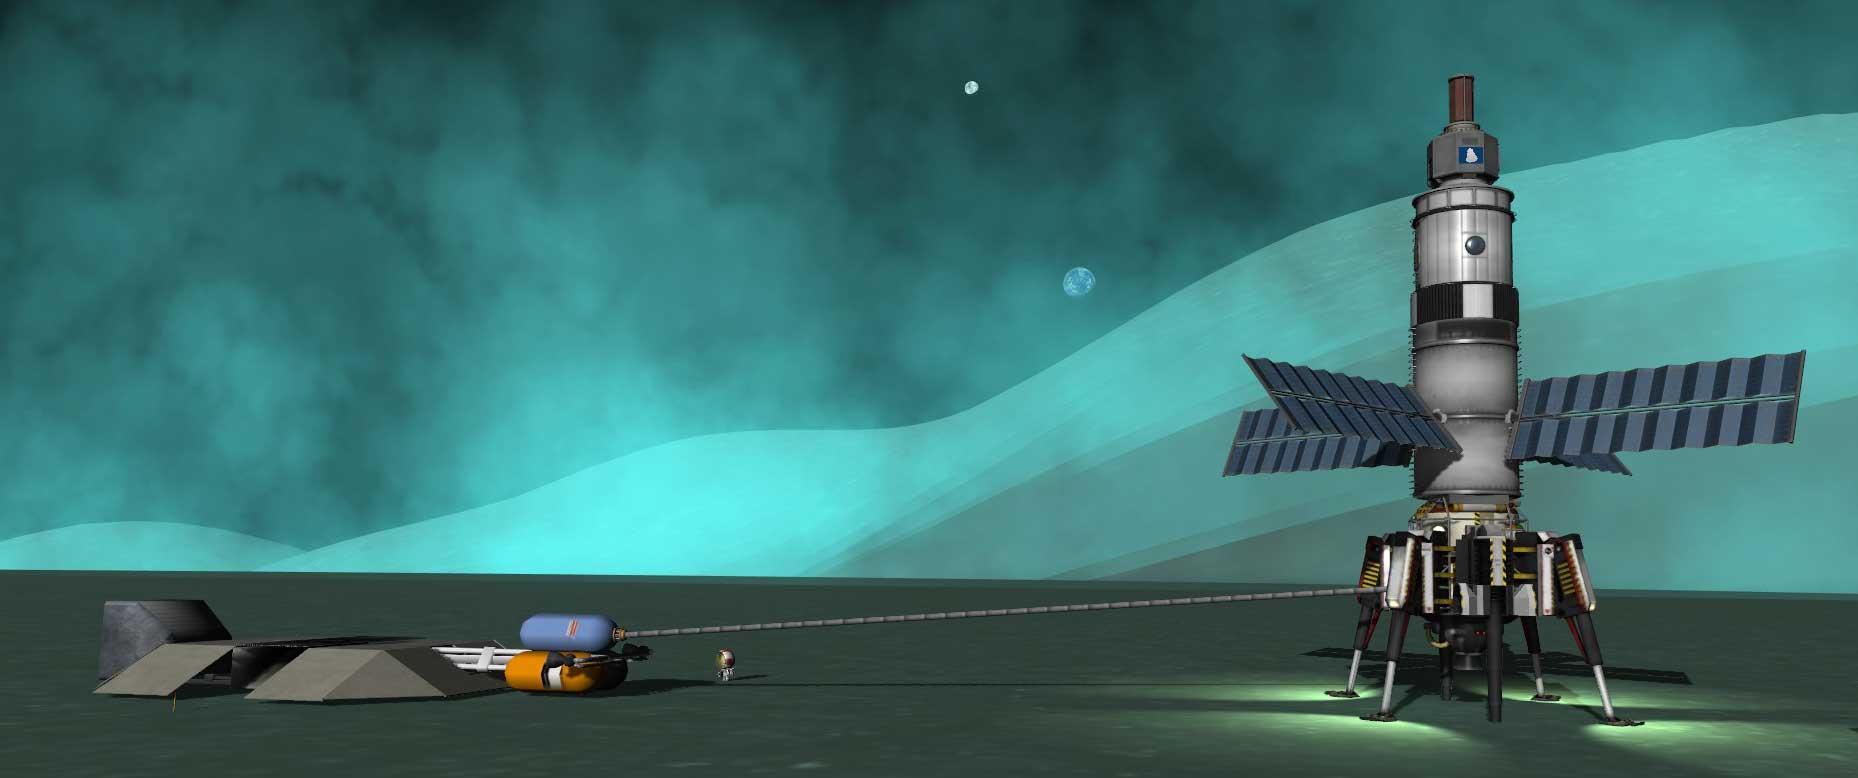 Kerbal Space Program: Stellar Expansions — Wisq net